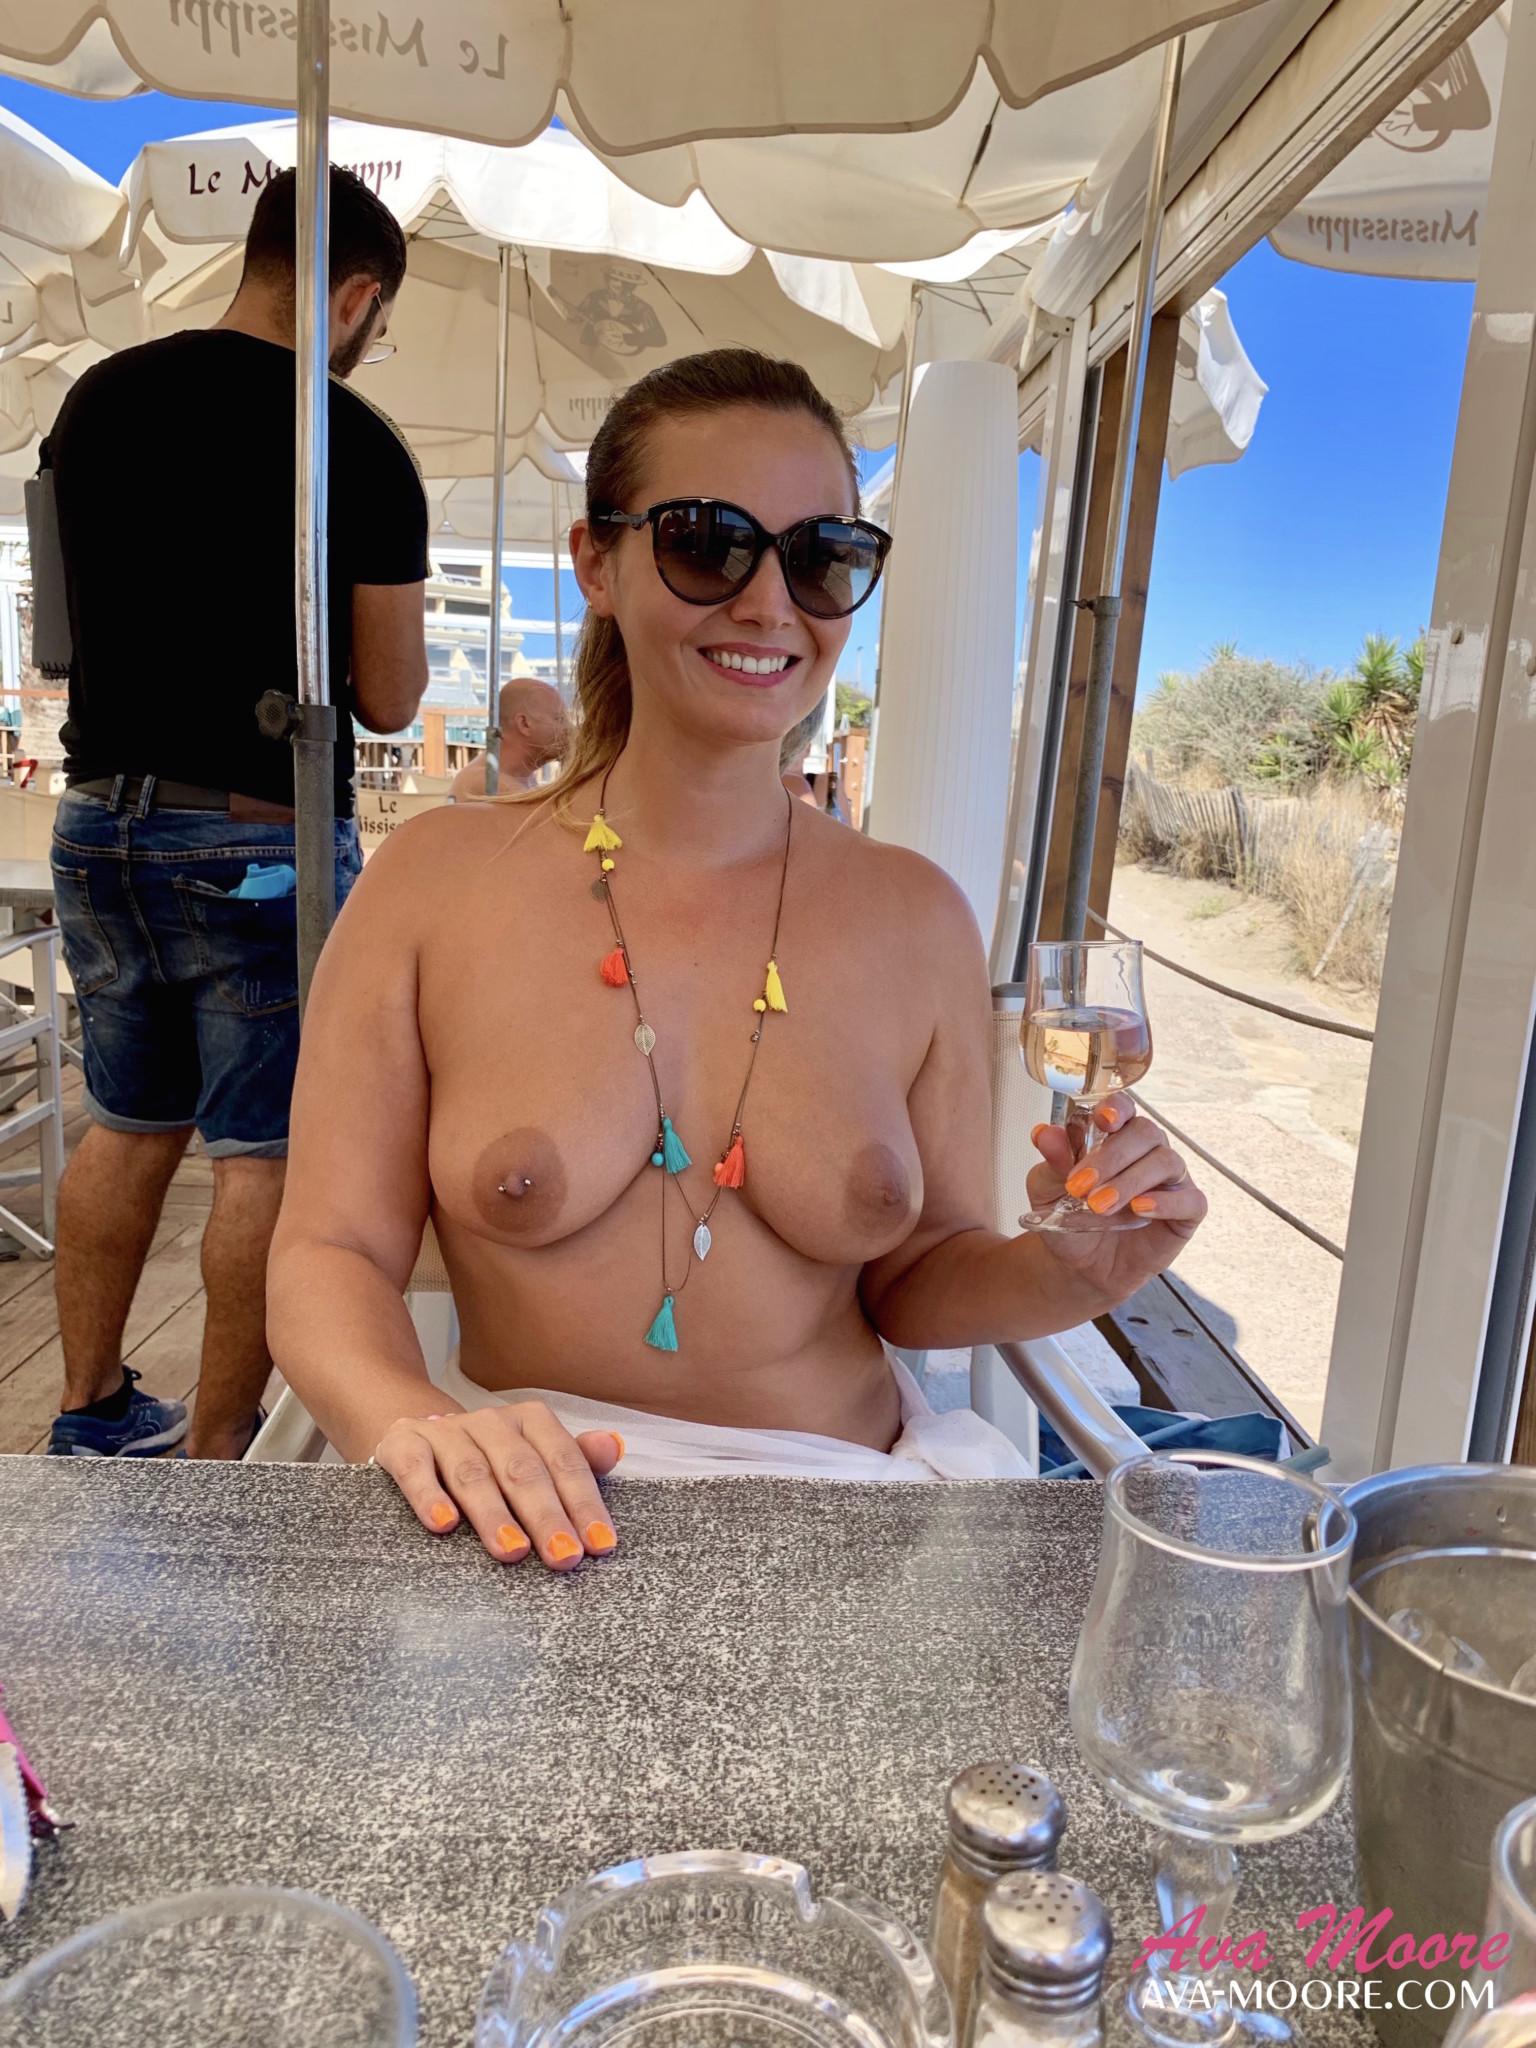 Ava Moore adore aller manger au Mississipi restaurant du village naturiste au Cap d'Agde